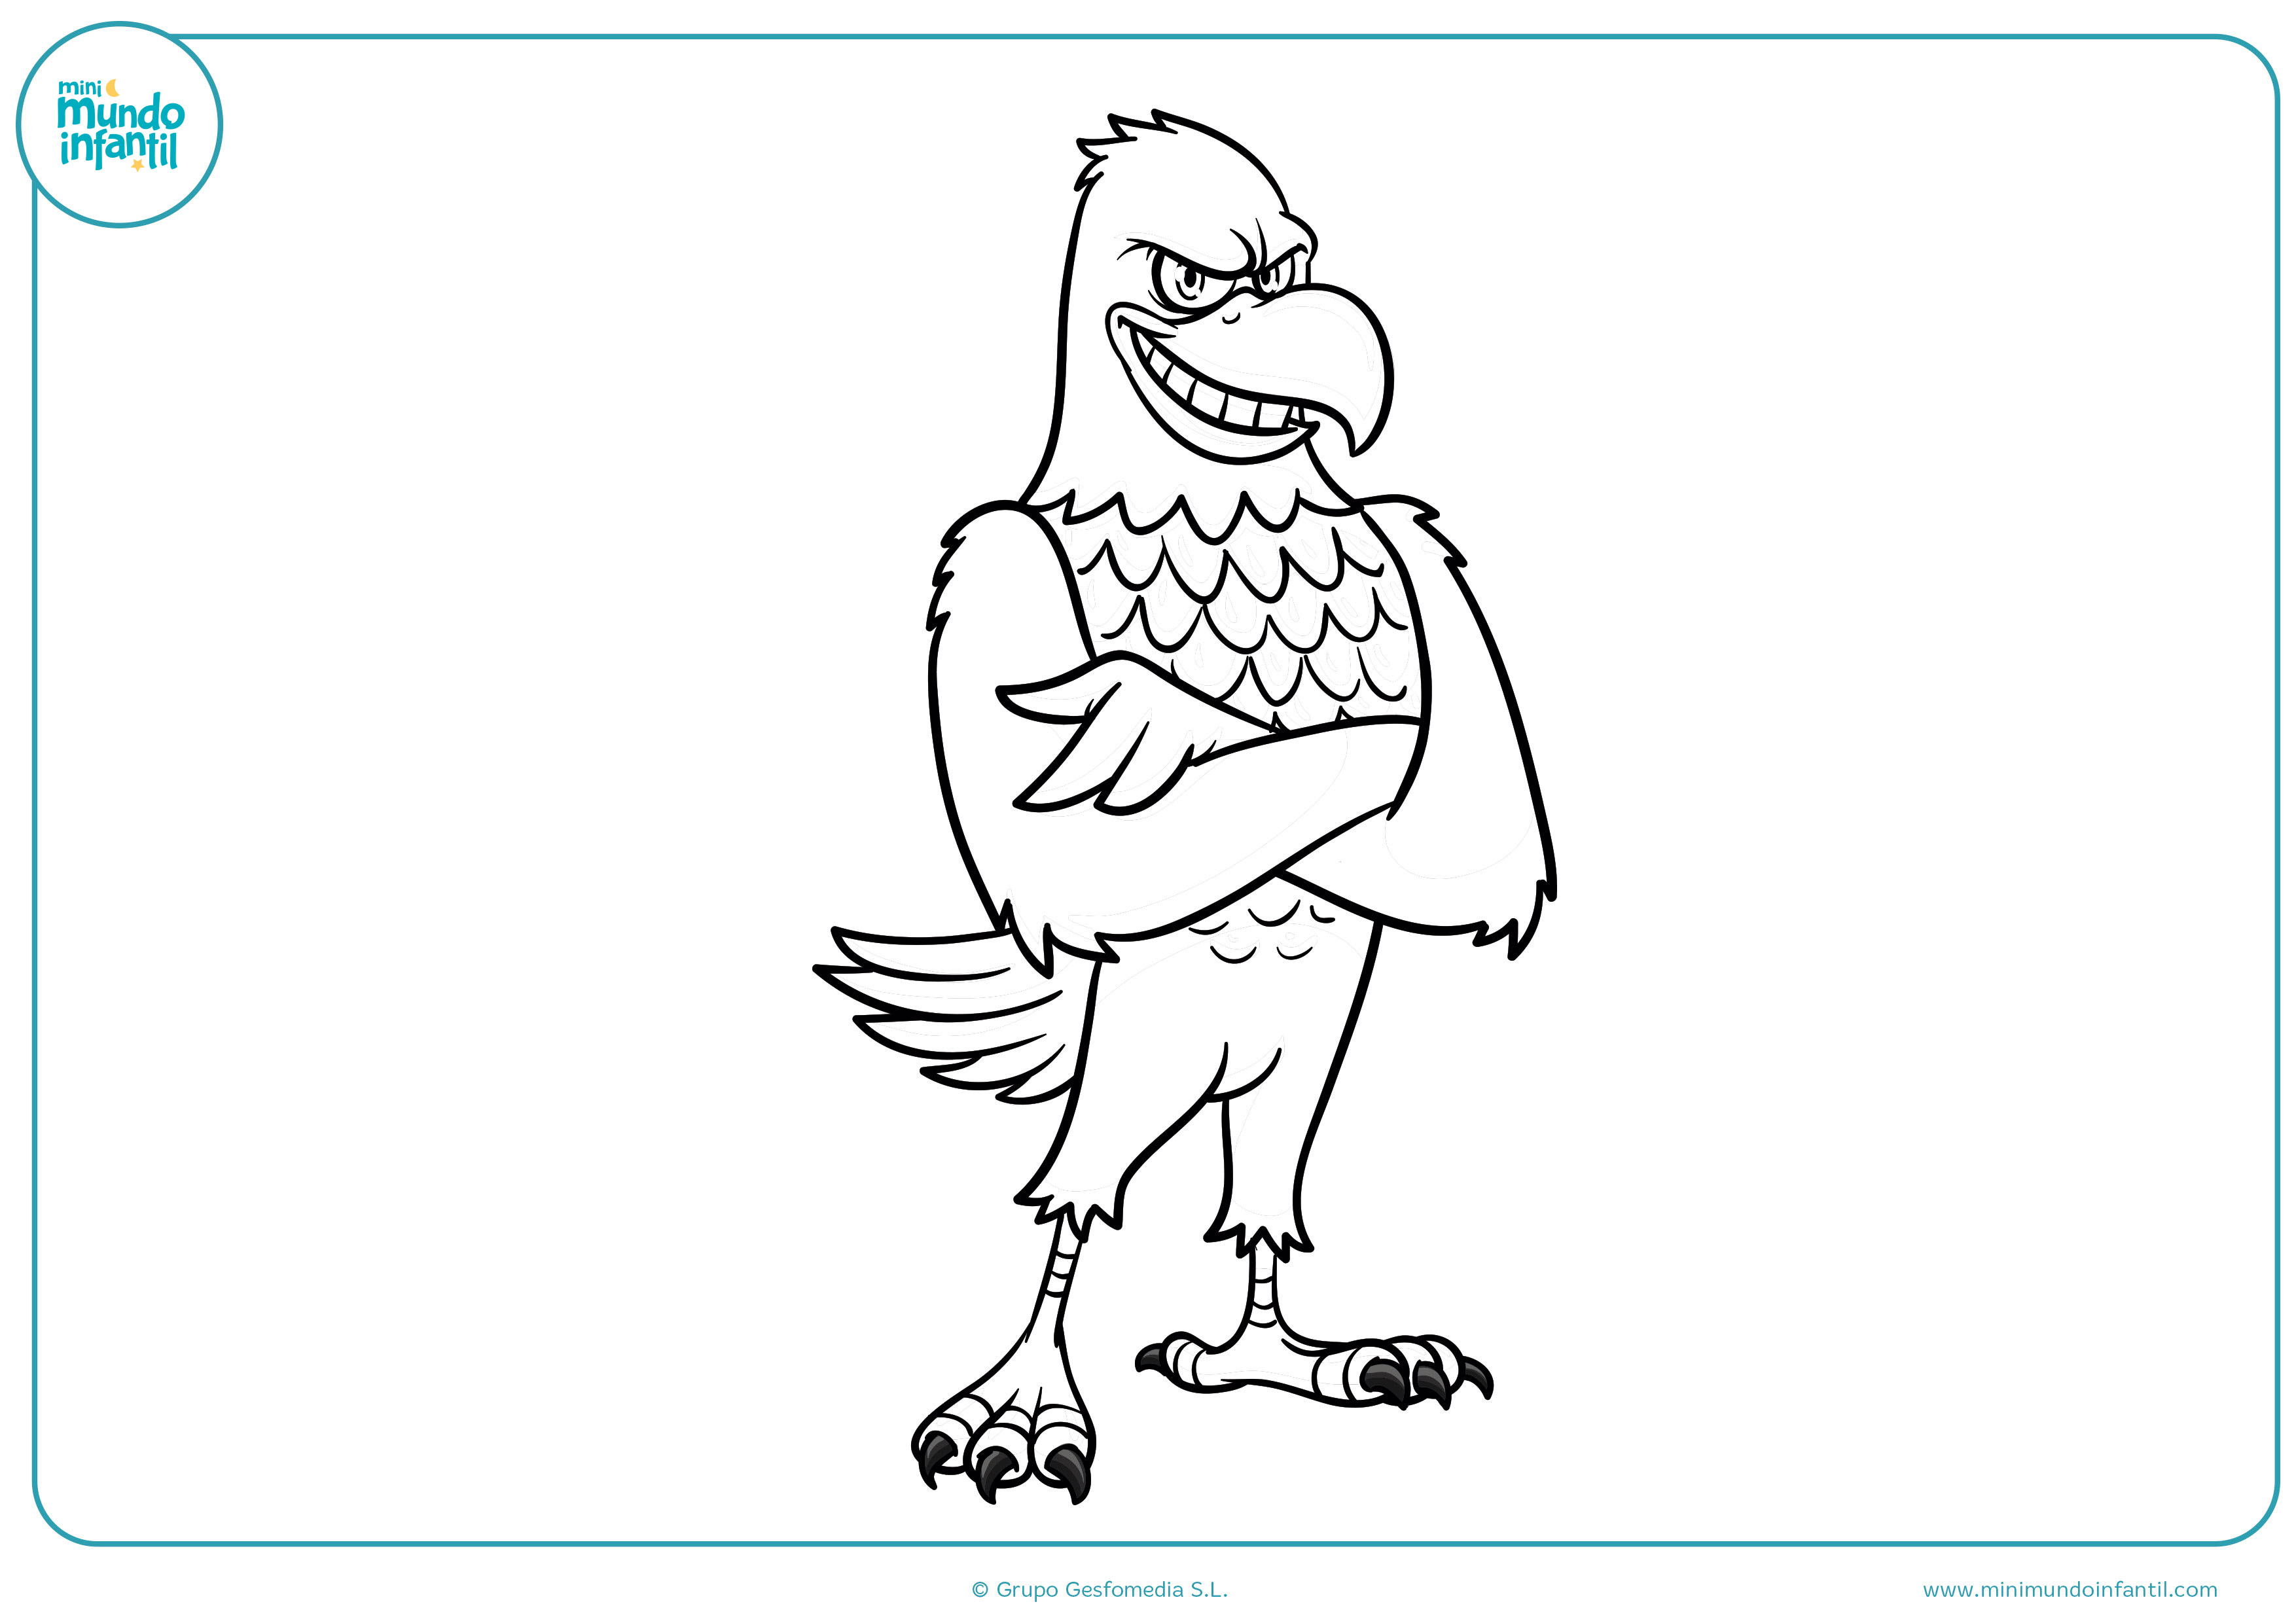 Dibujos de aves para colorear - Mundo Primaria